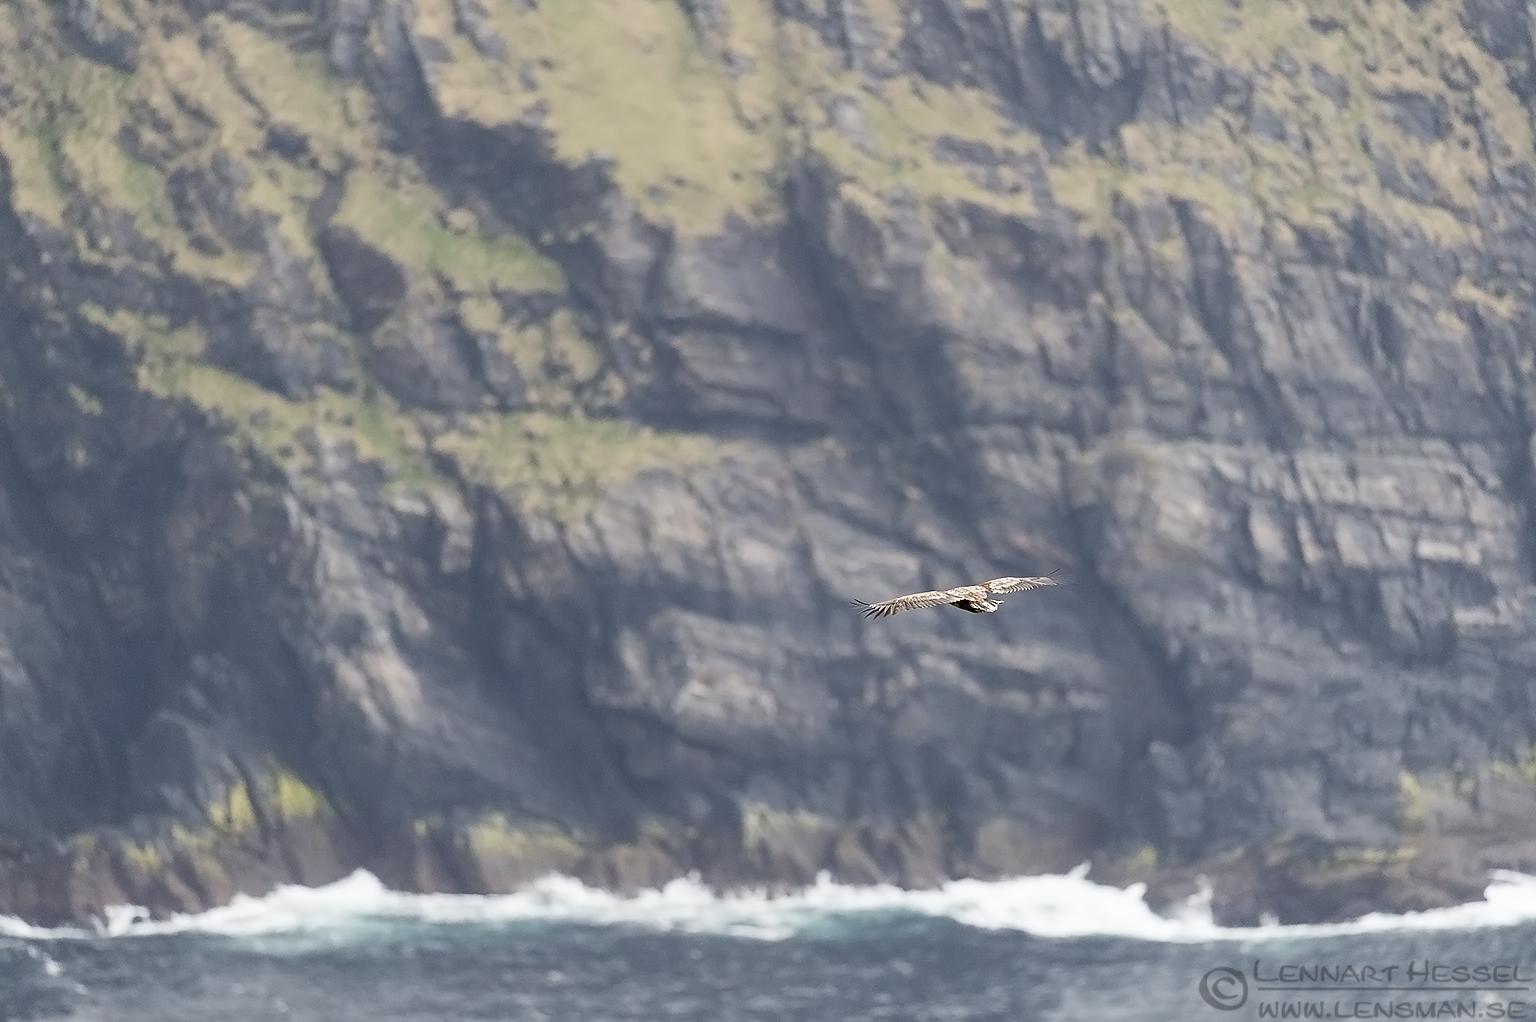 White-tailed Eagle in habitat Runde